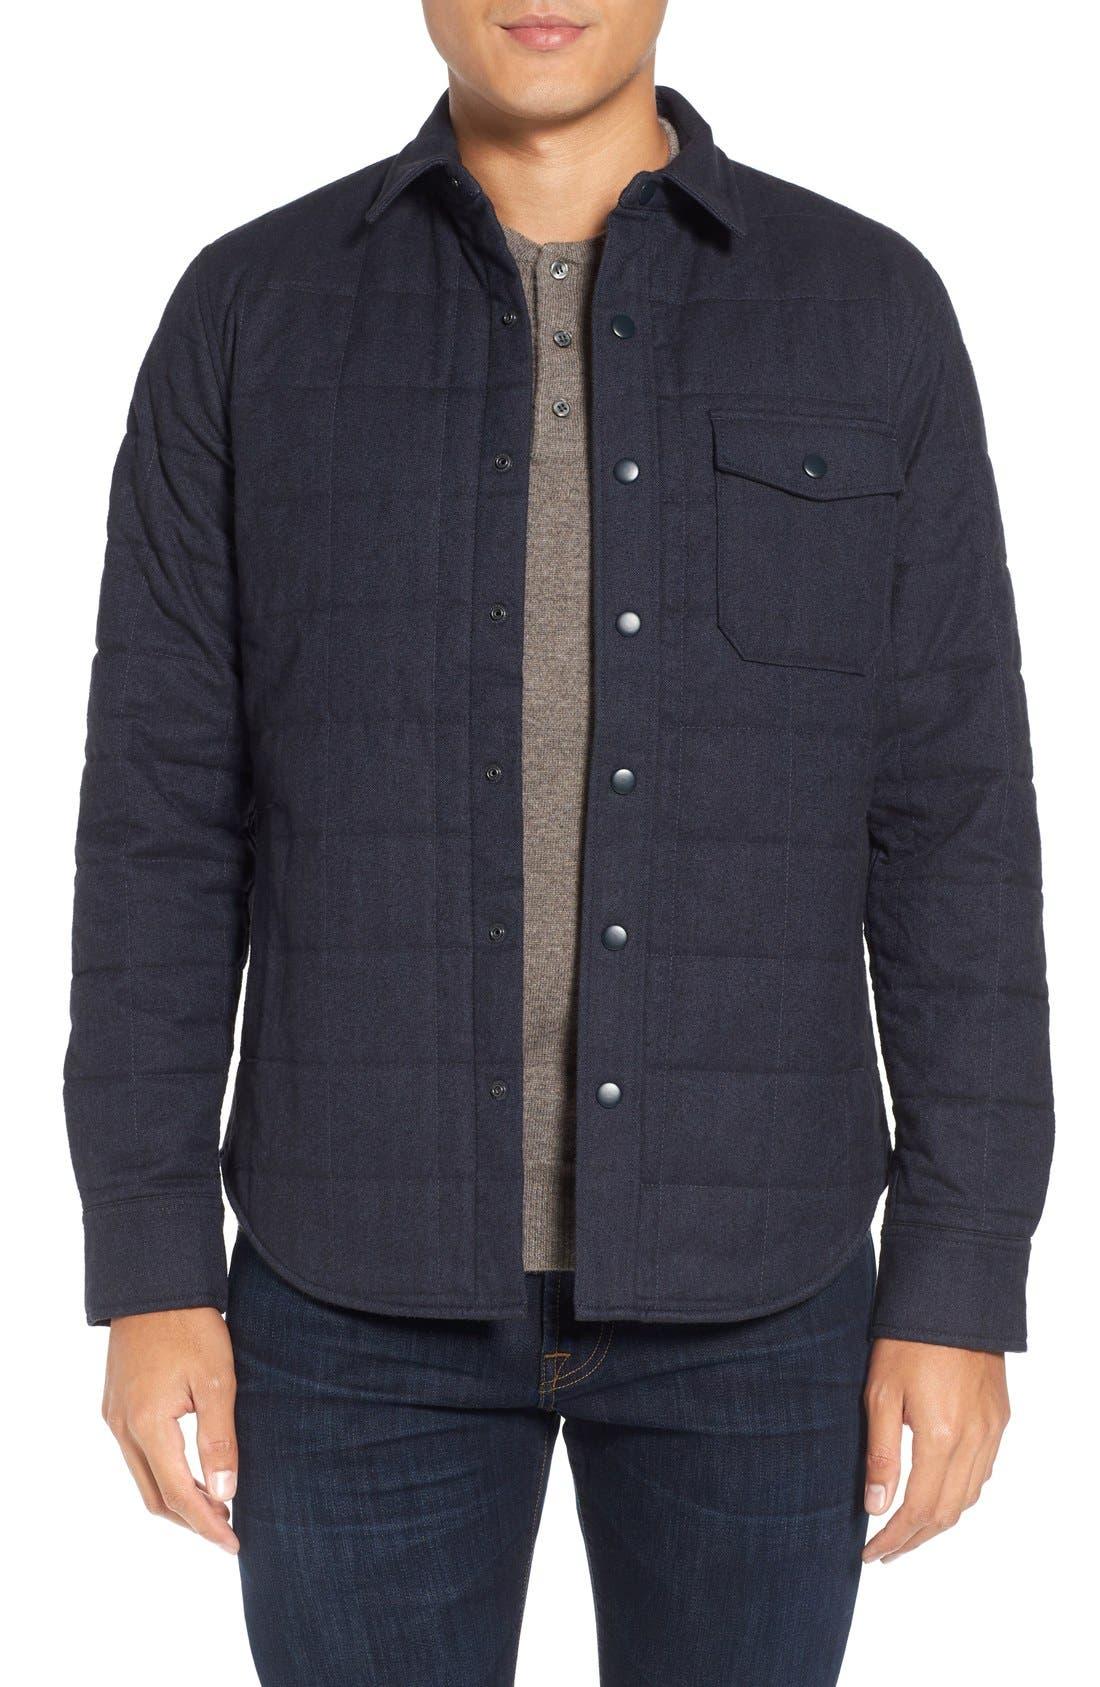 Alternate Image 1 Selected - Bonobos Quilted Herringbone Shirt Jacket